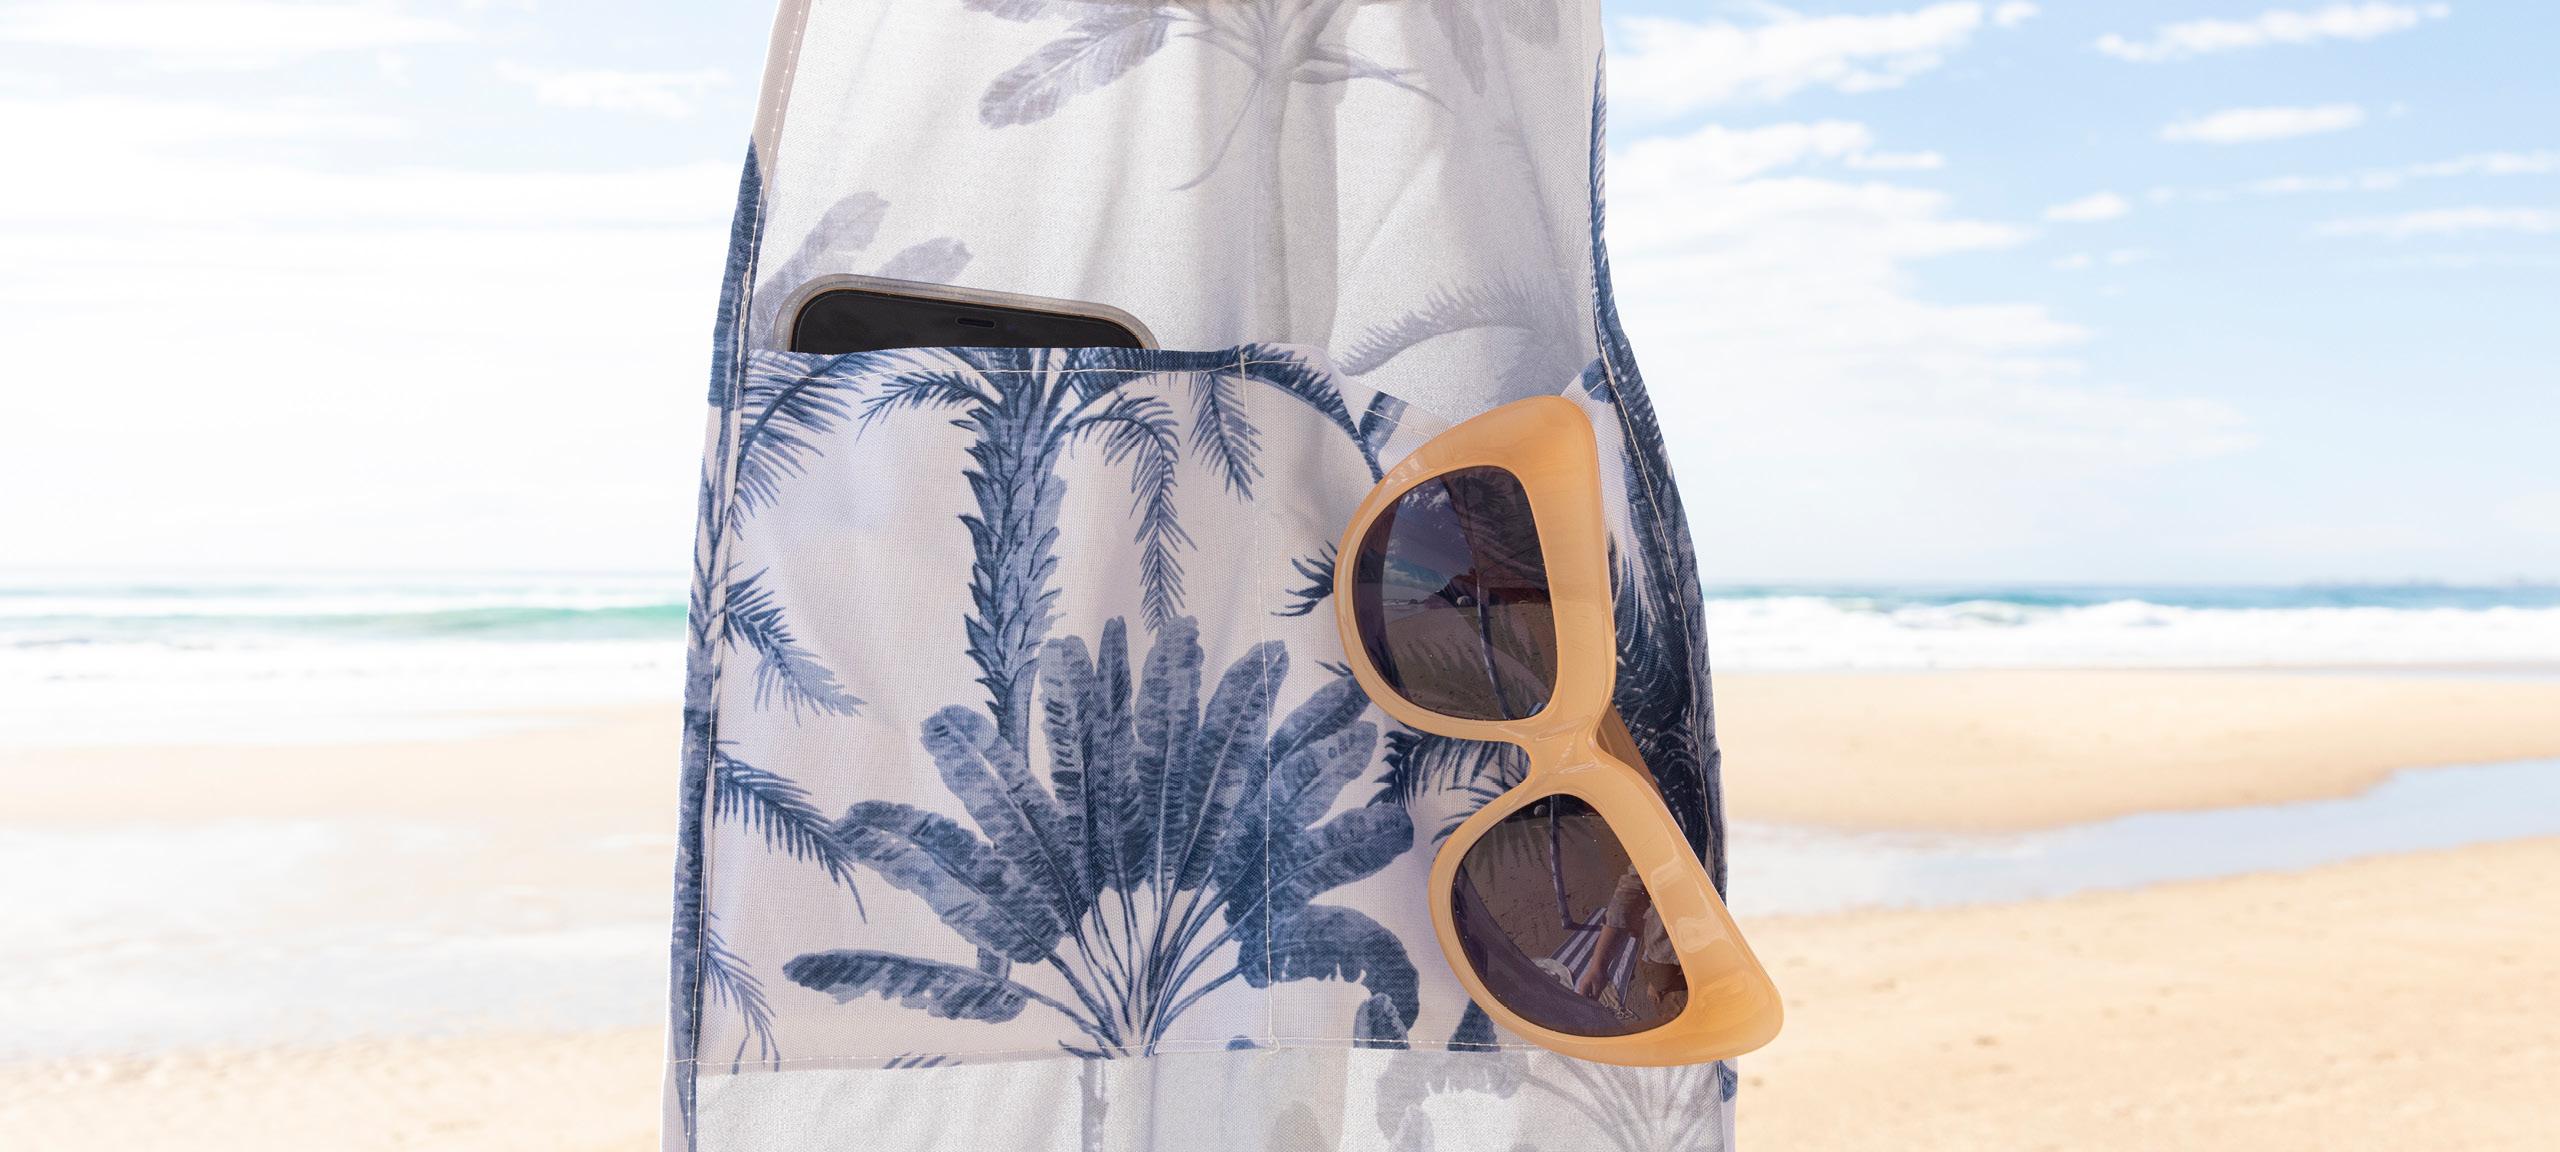 Blue palm beach cabana